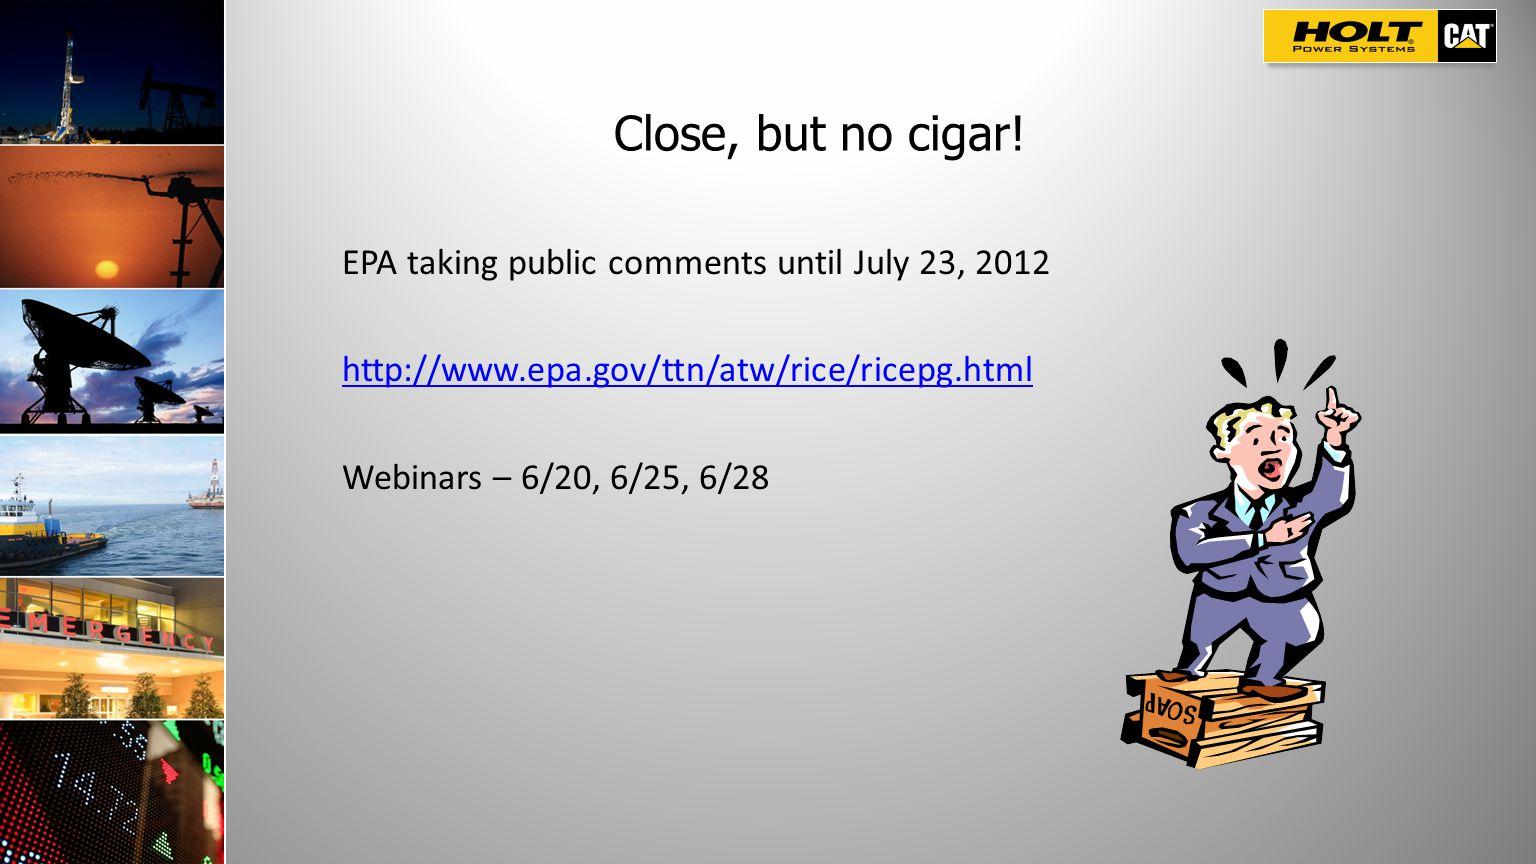 Close, but no cigar! EPA taking public comments until July 23, 2012 http://www.epa.gov/ttn/atw/rice/ricepg.html Webinars – 6/20, 6/25, 6/28